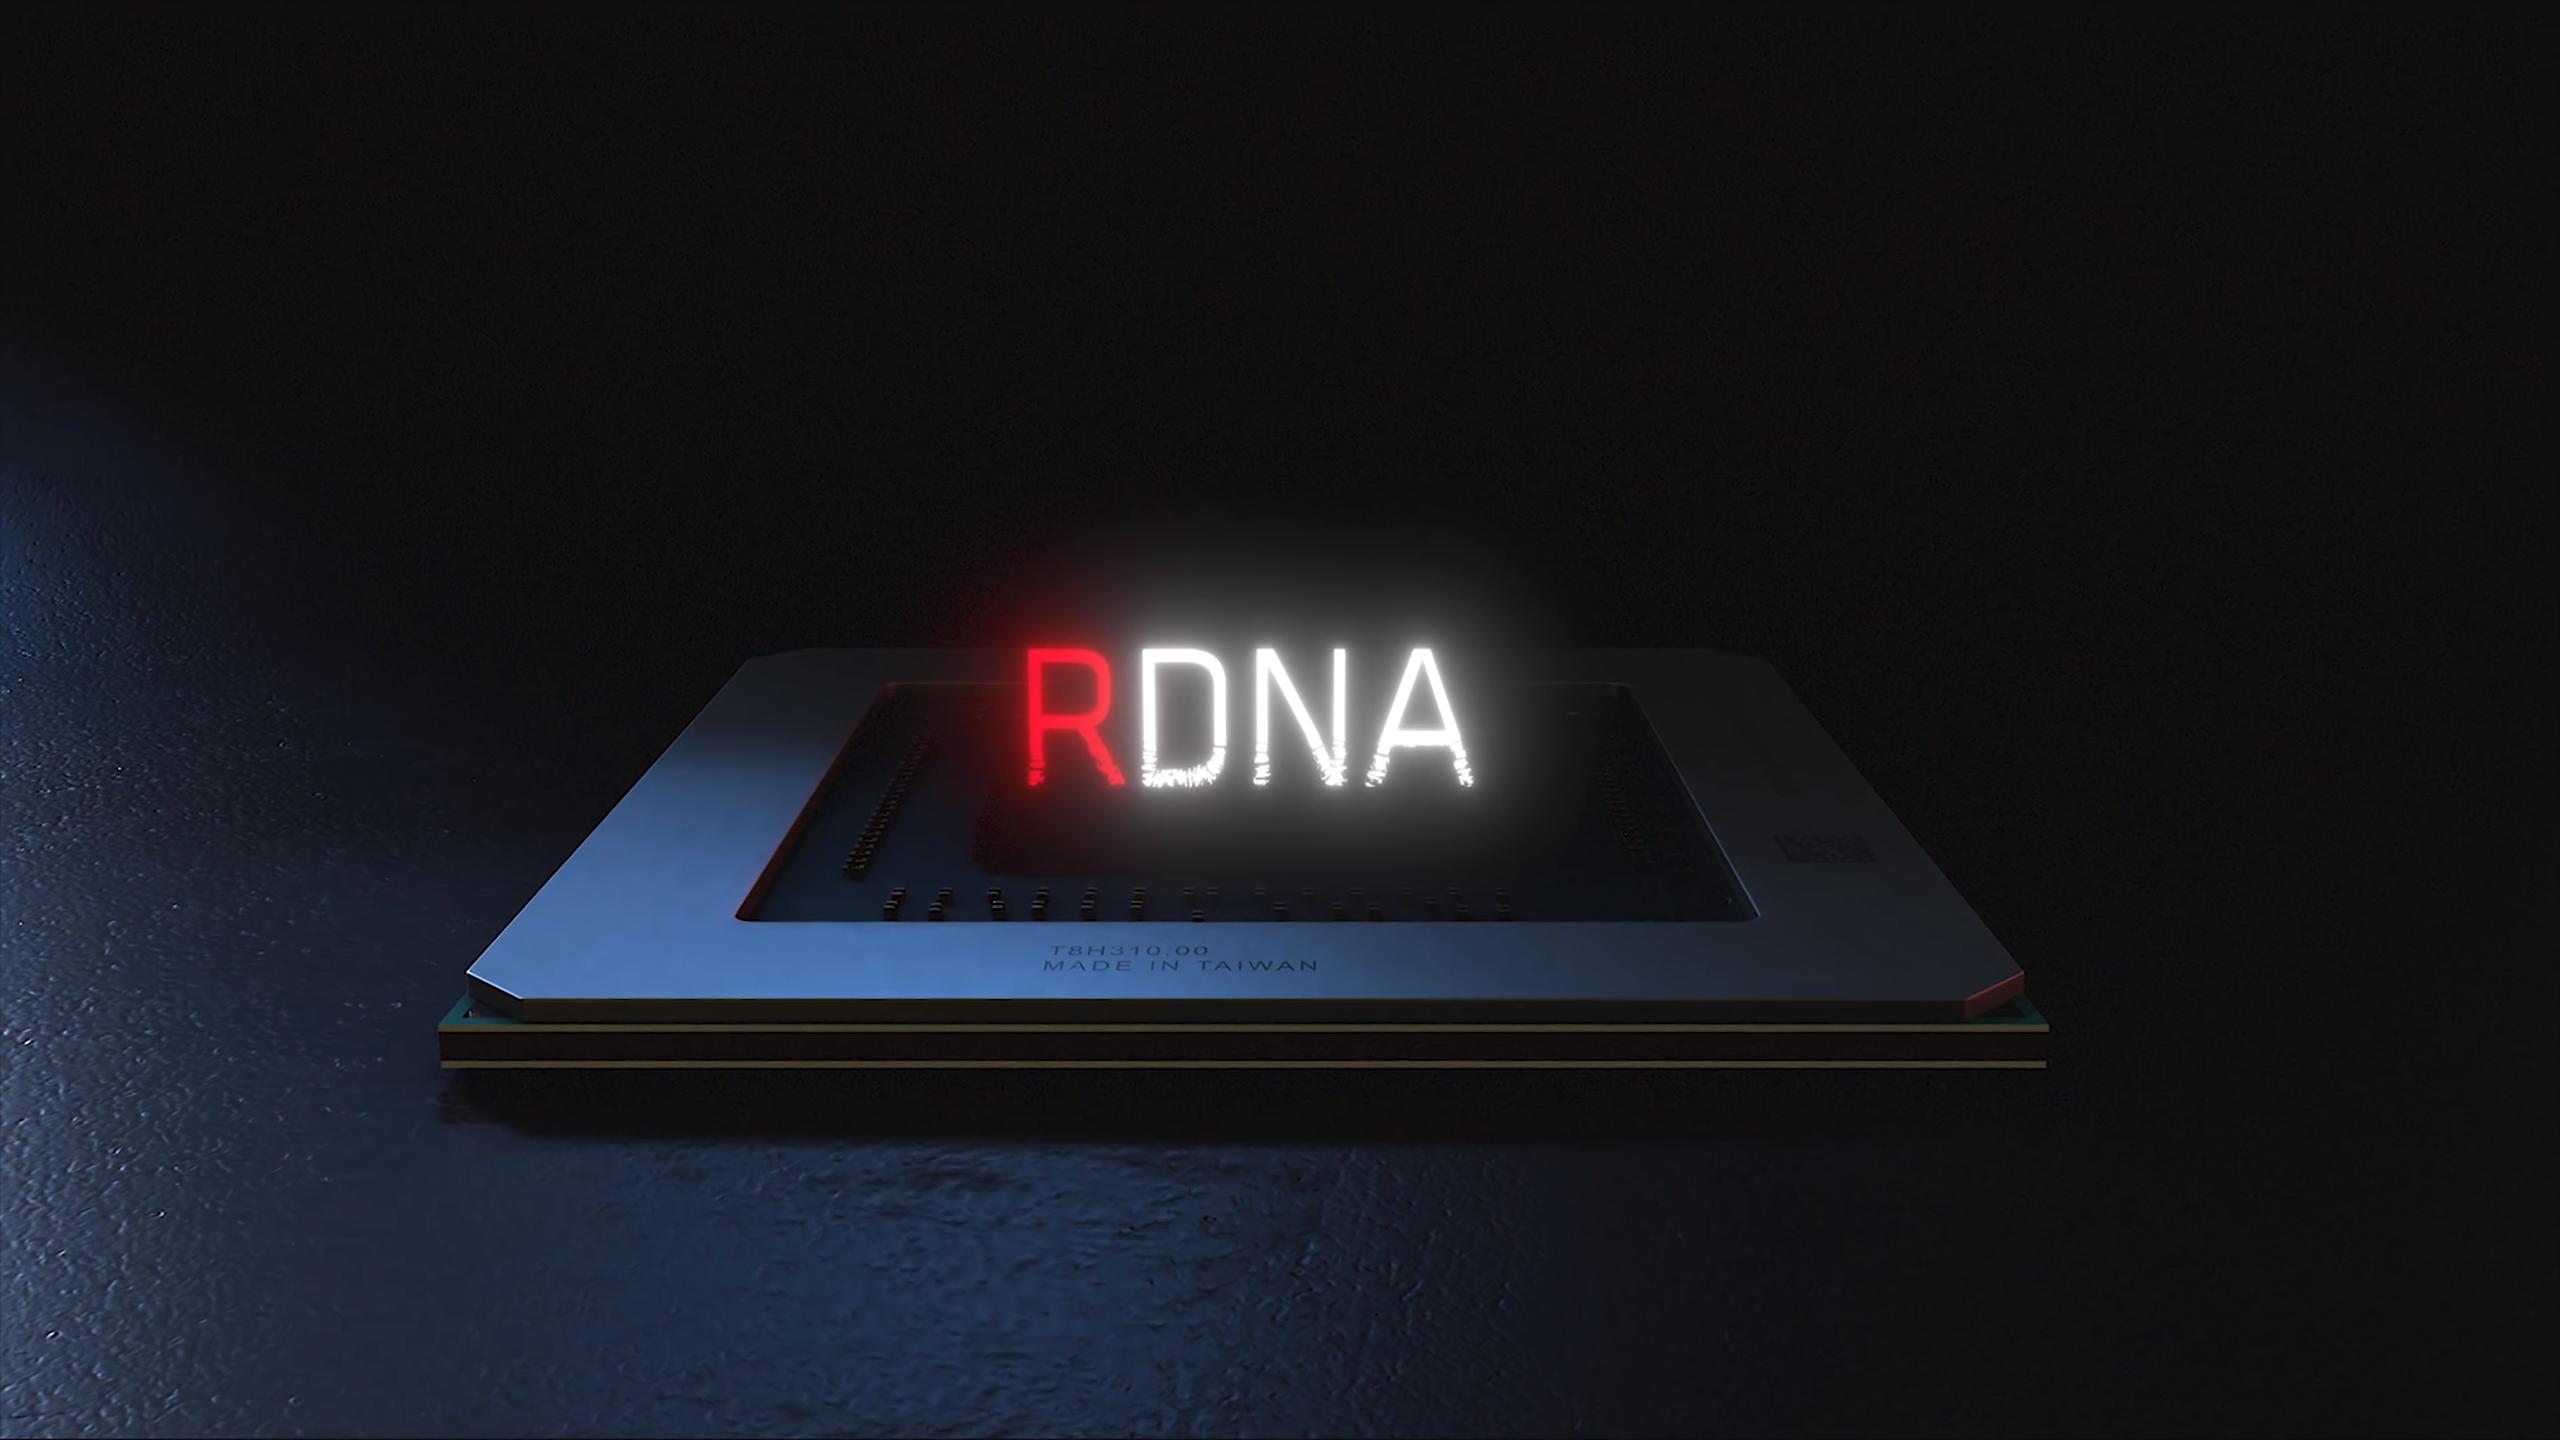 Раскрыты характеристики RX 5500 XT и Radeon RX 5500 - до 8 Гб GDDR6, 6,4 миллиарда транзисторов